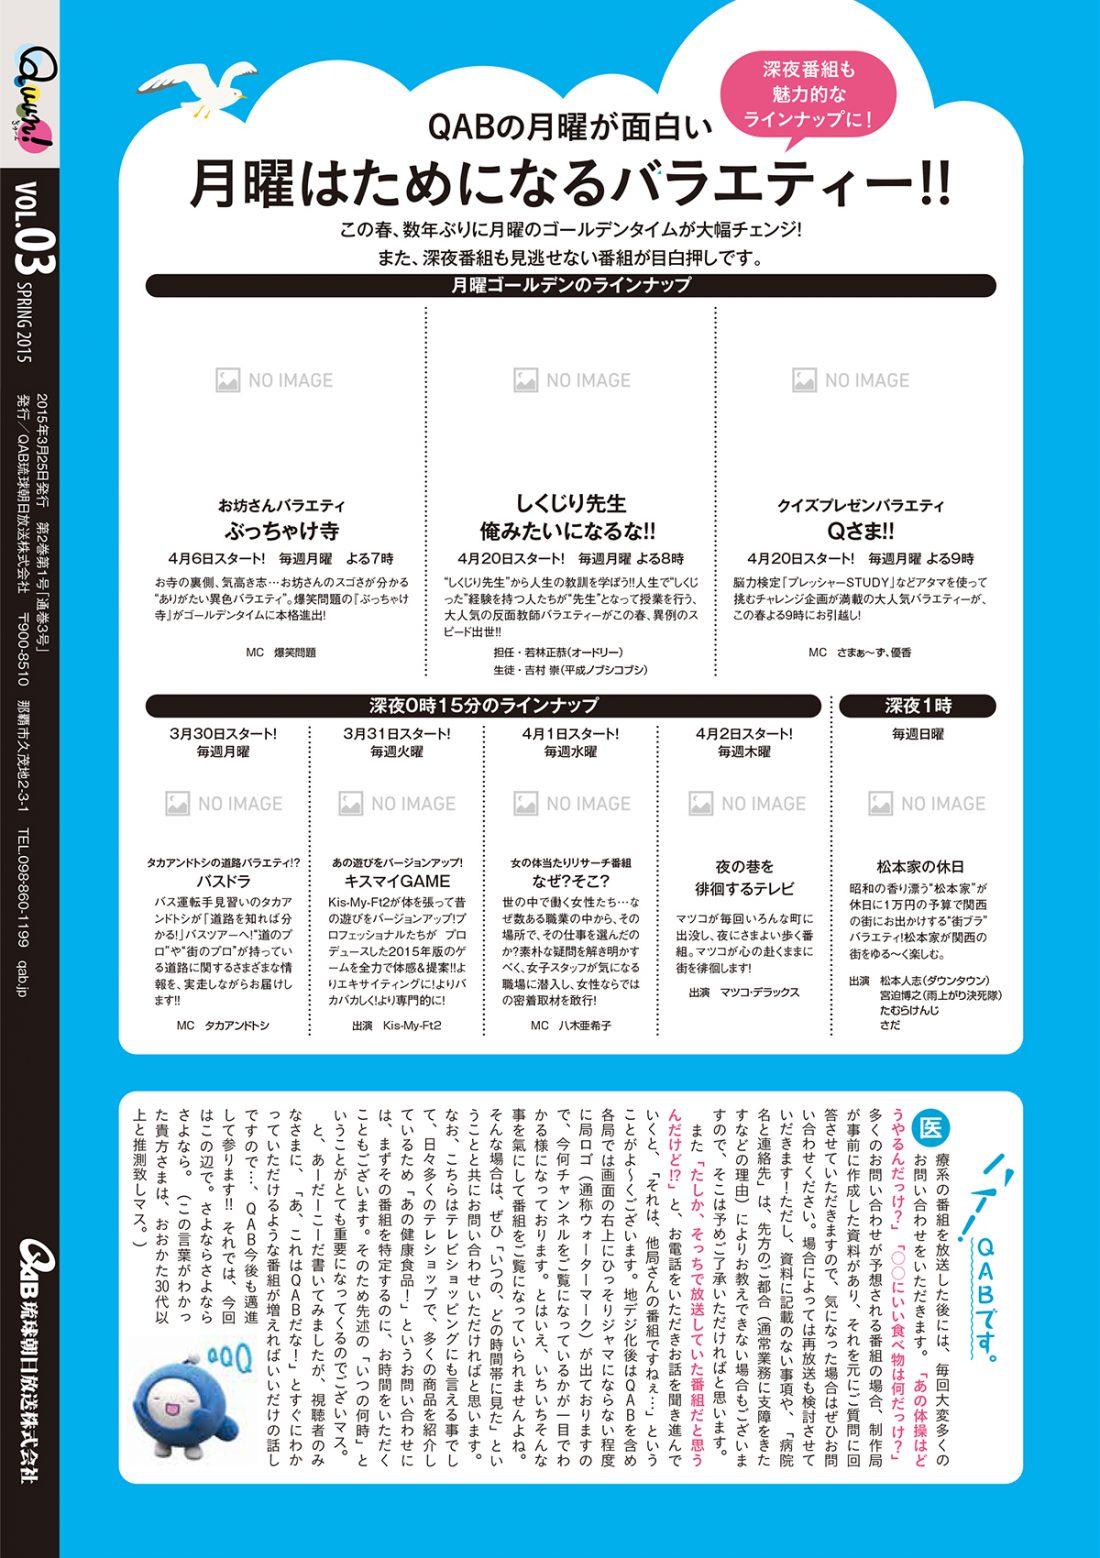 https://www.qab.co.jp/qgoro/wp-content/uploads/quun_0316-1100x1558.jpg